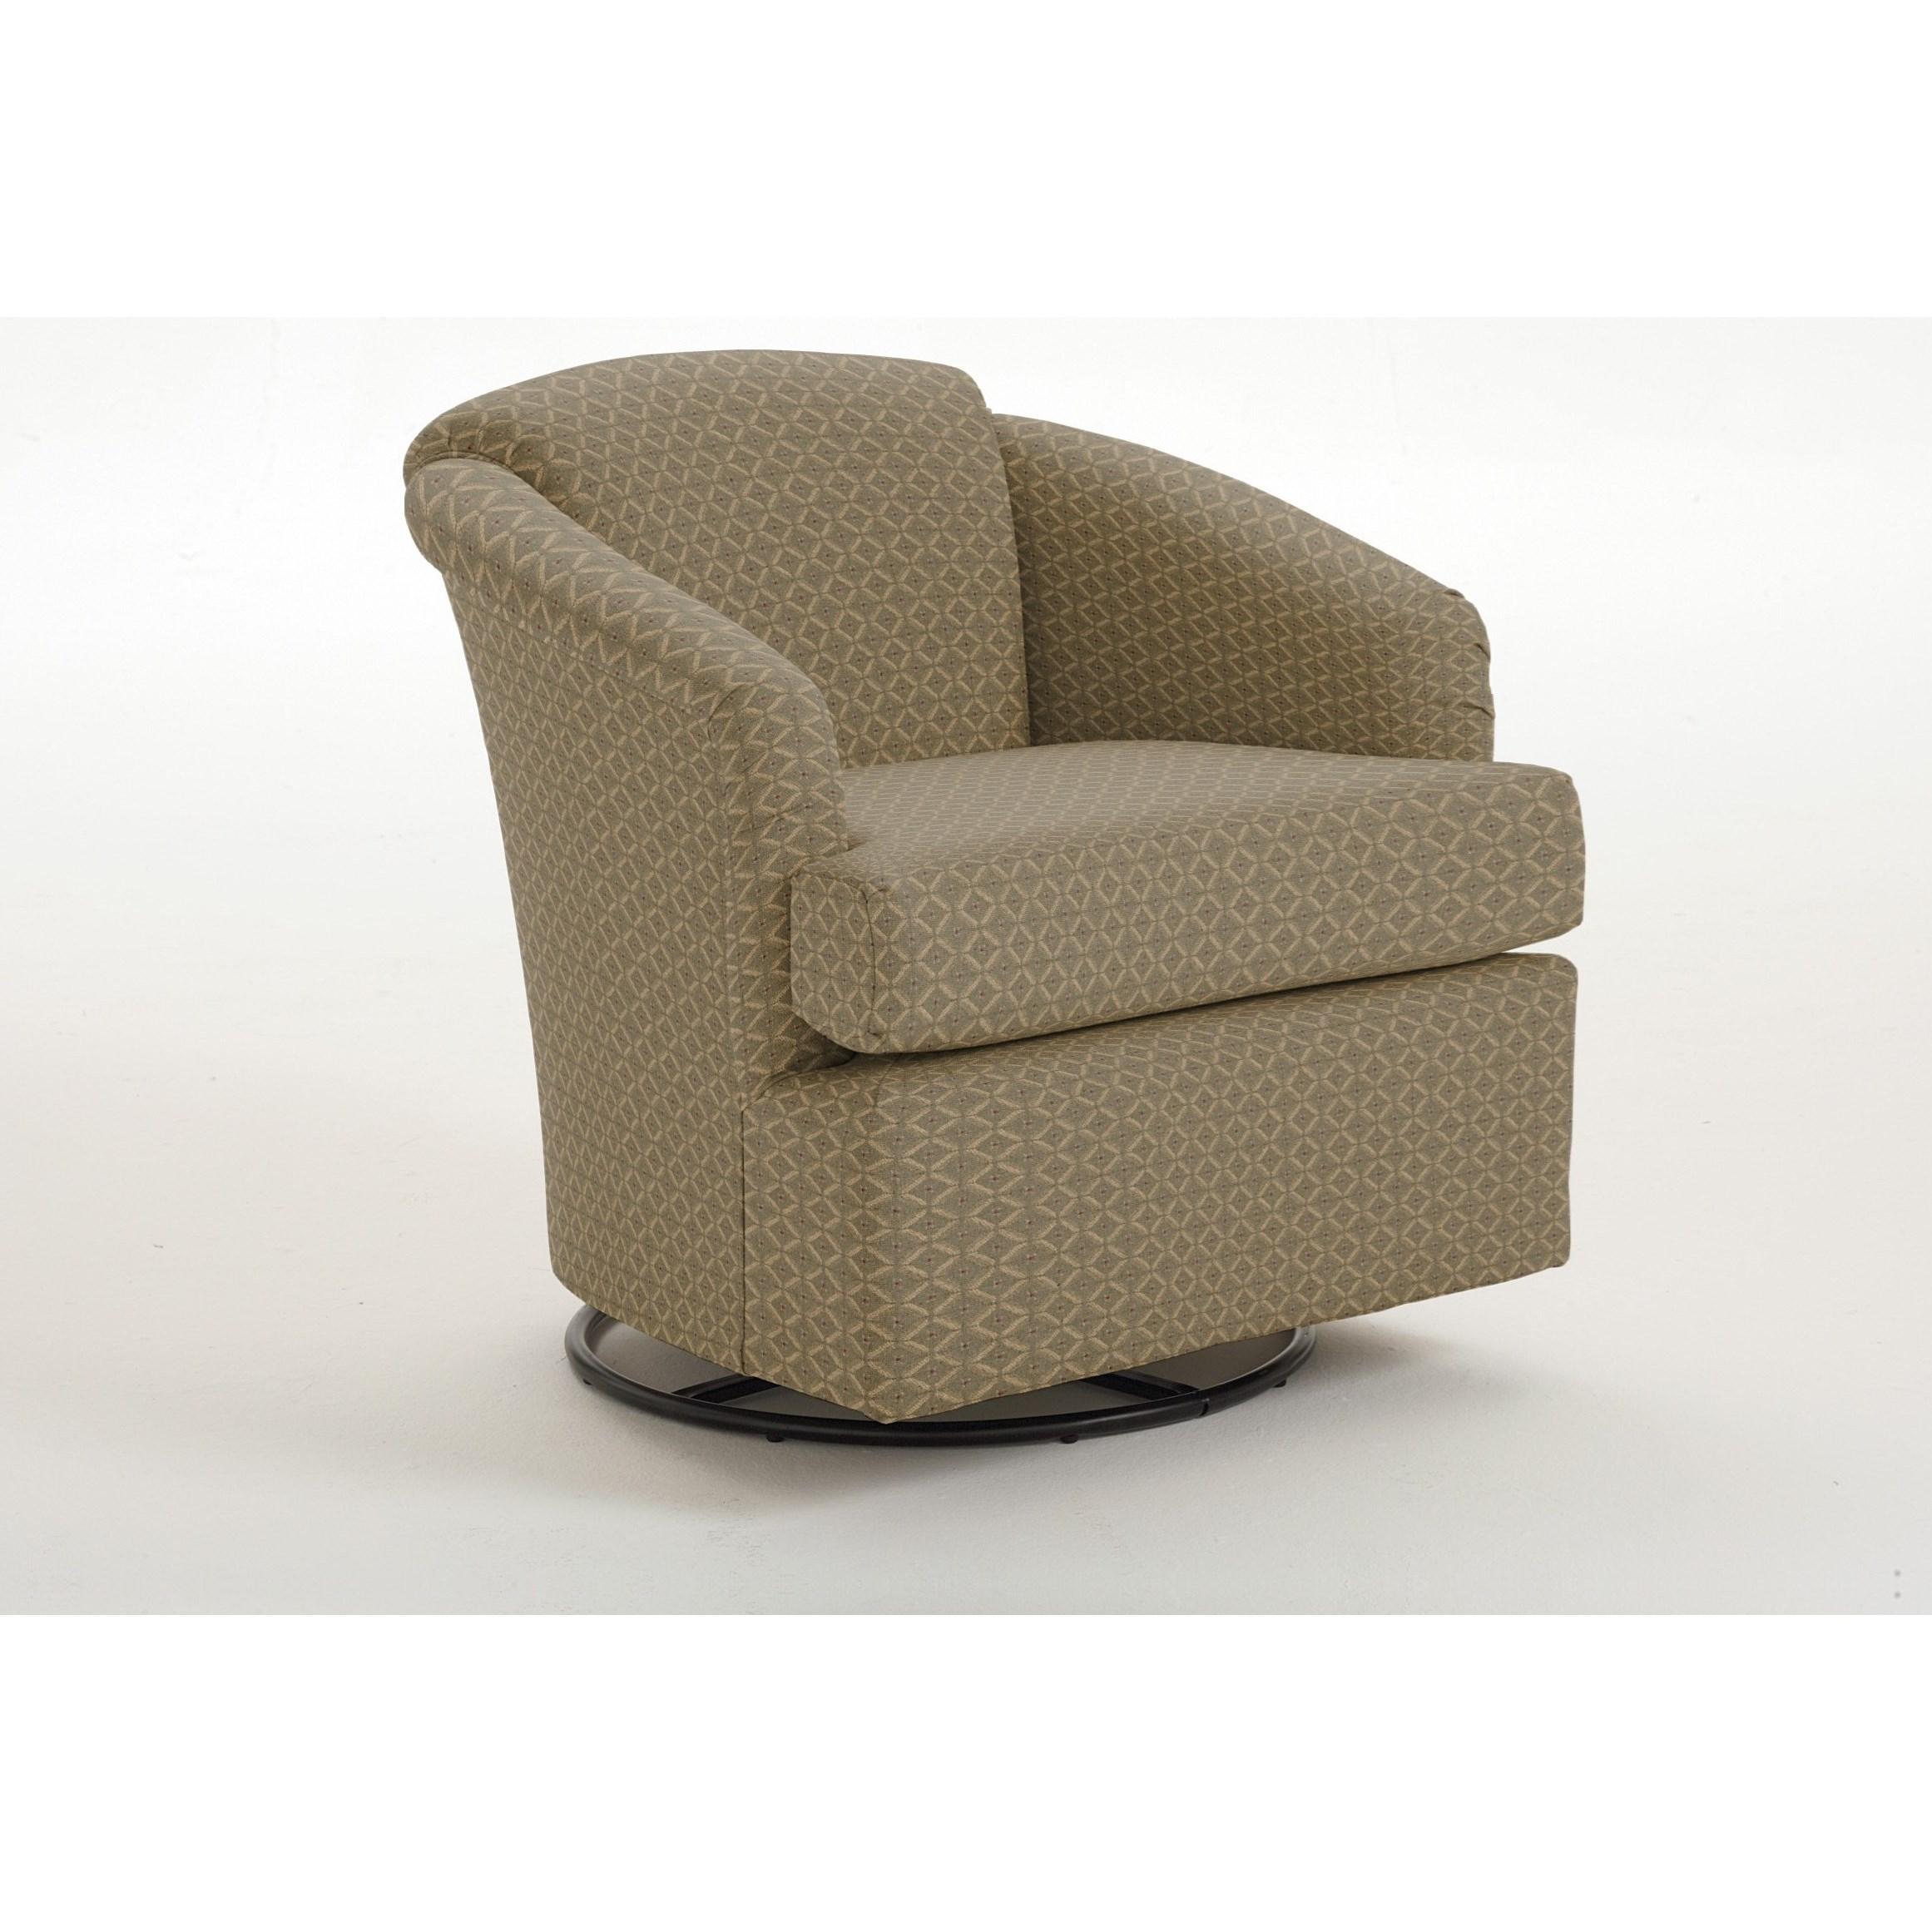 Beau Best Home Furnishings Chairs   Swivel BarrelCass Swivel Barrel Chair